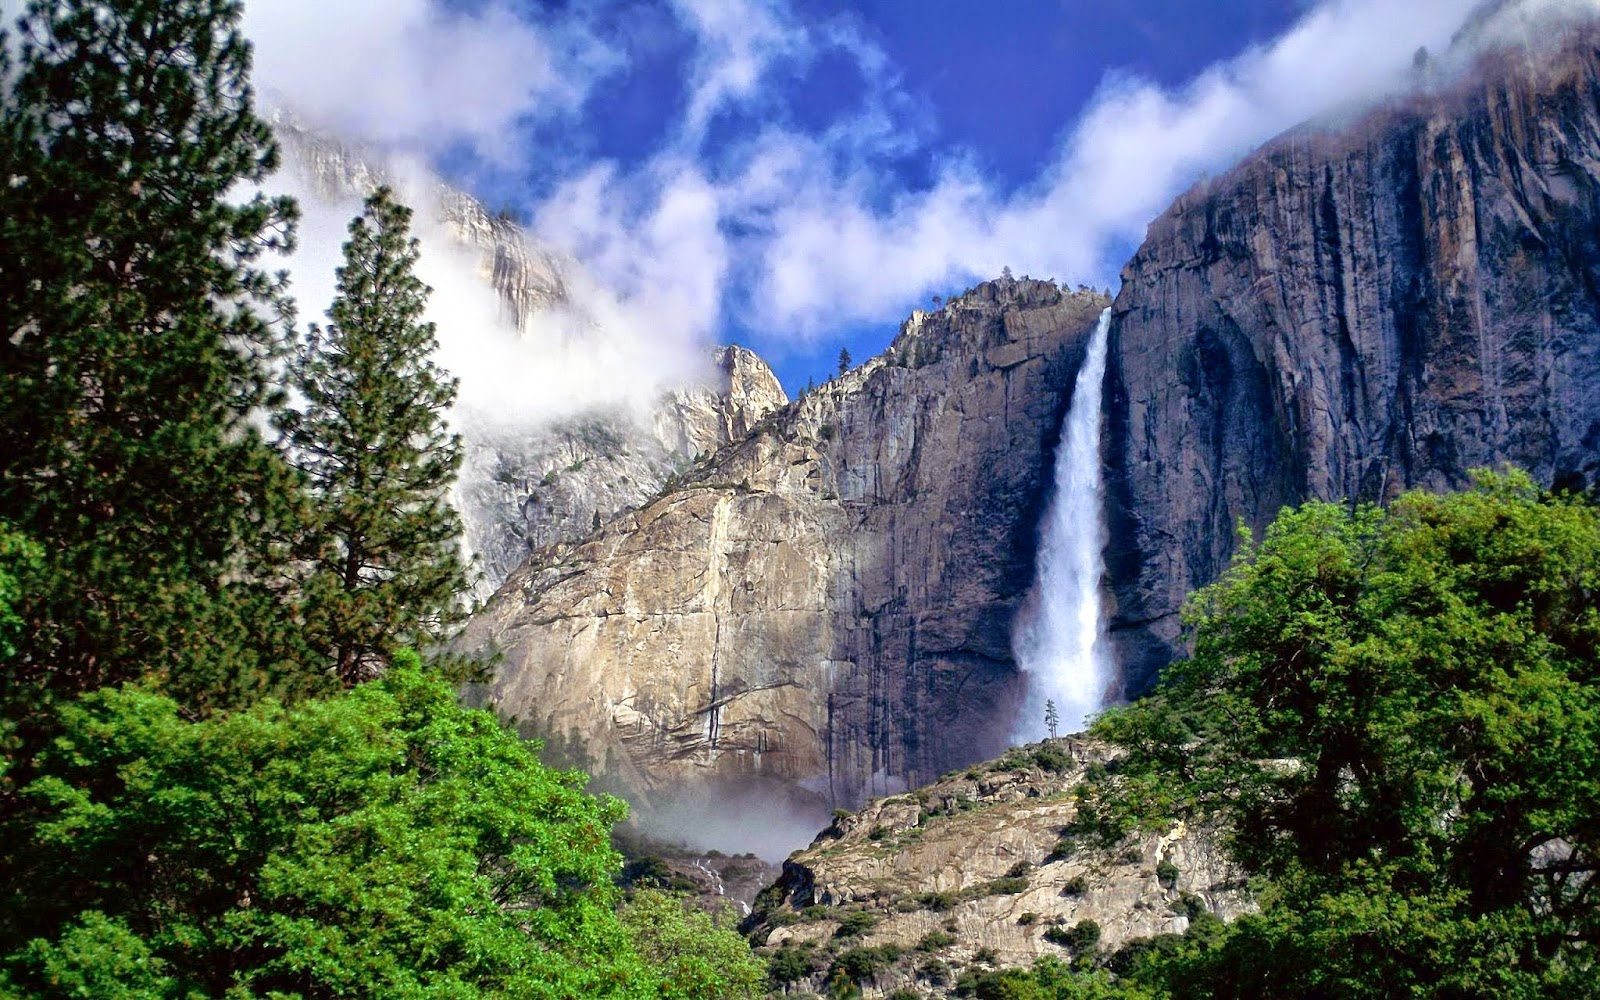 Free Yosemite Wallpaper Yosemite Hikes - nevada fall yosemite national park wallpapers